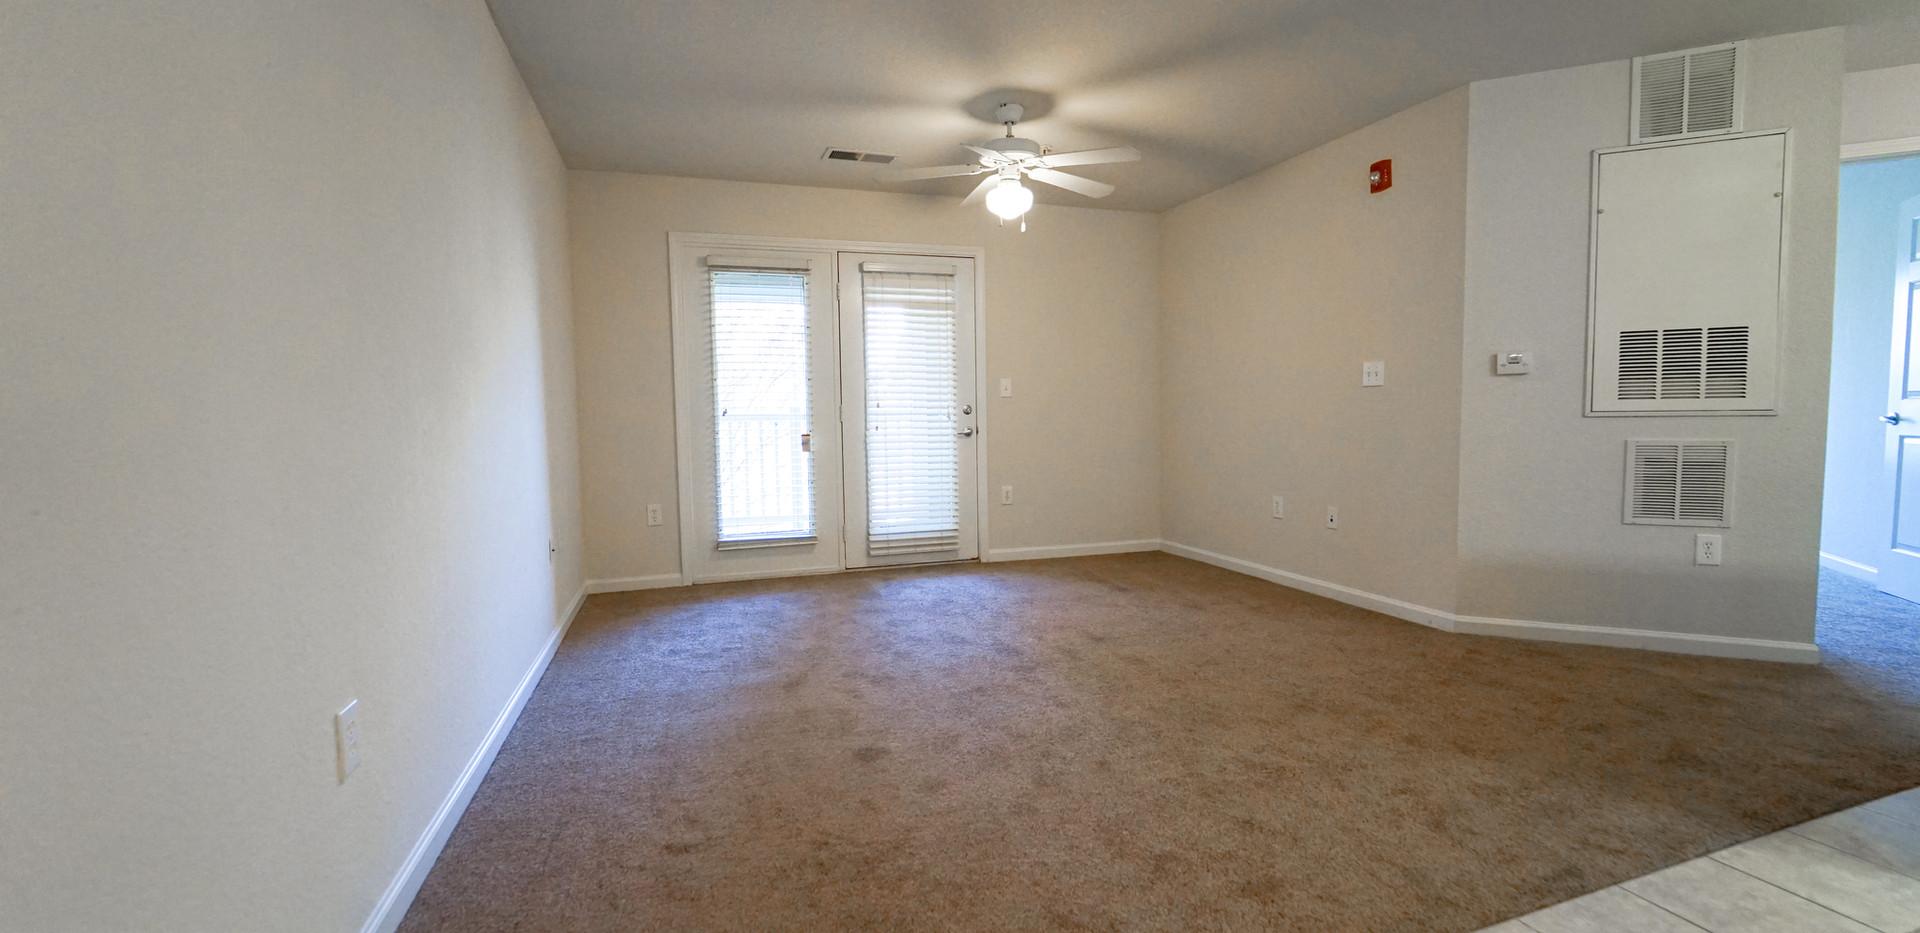 Unfurnished Bedroom Photo